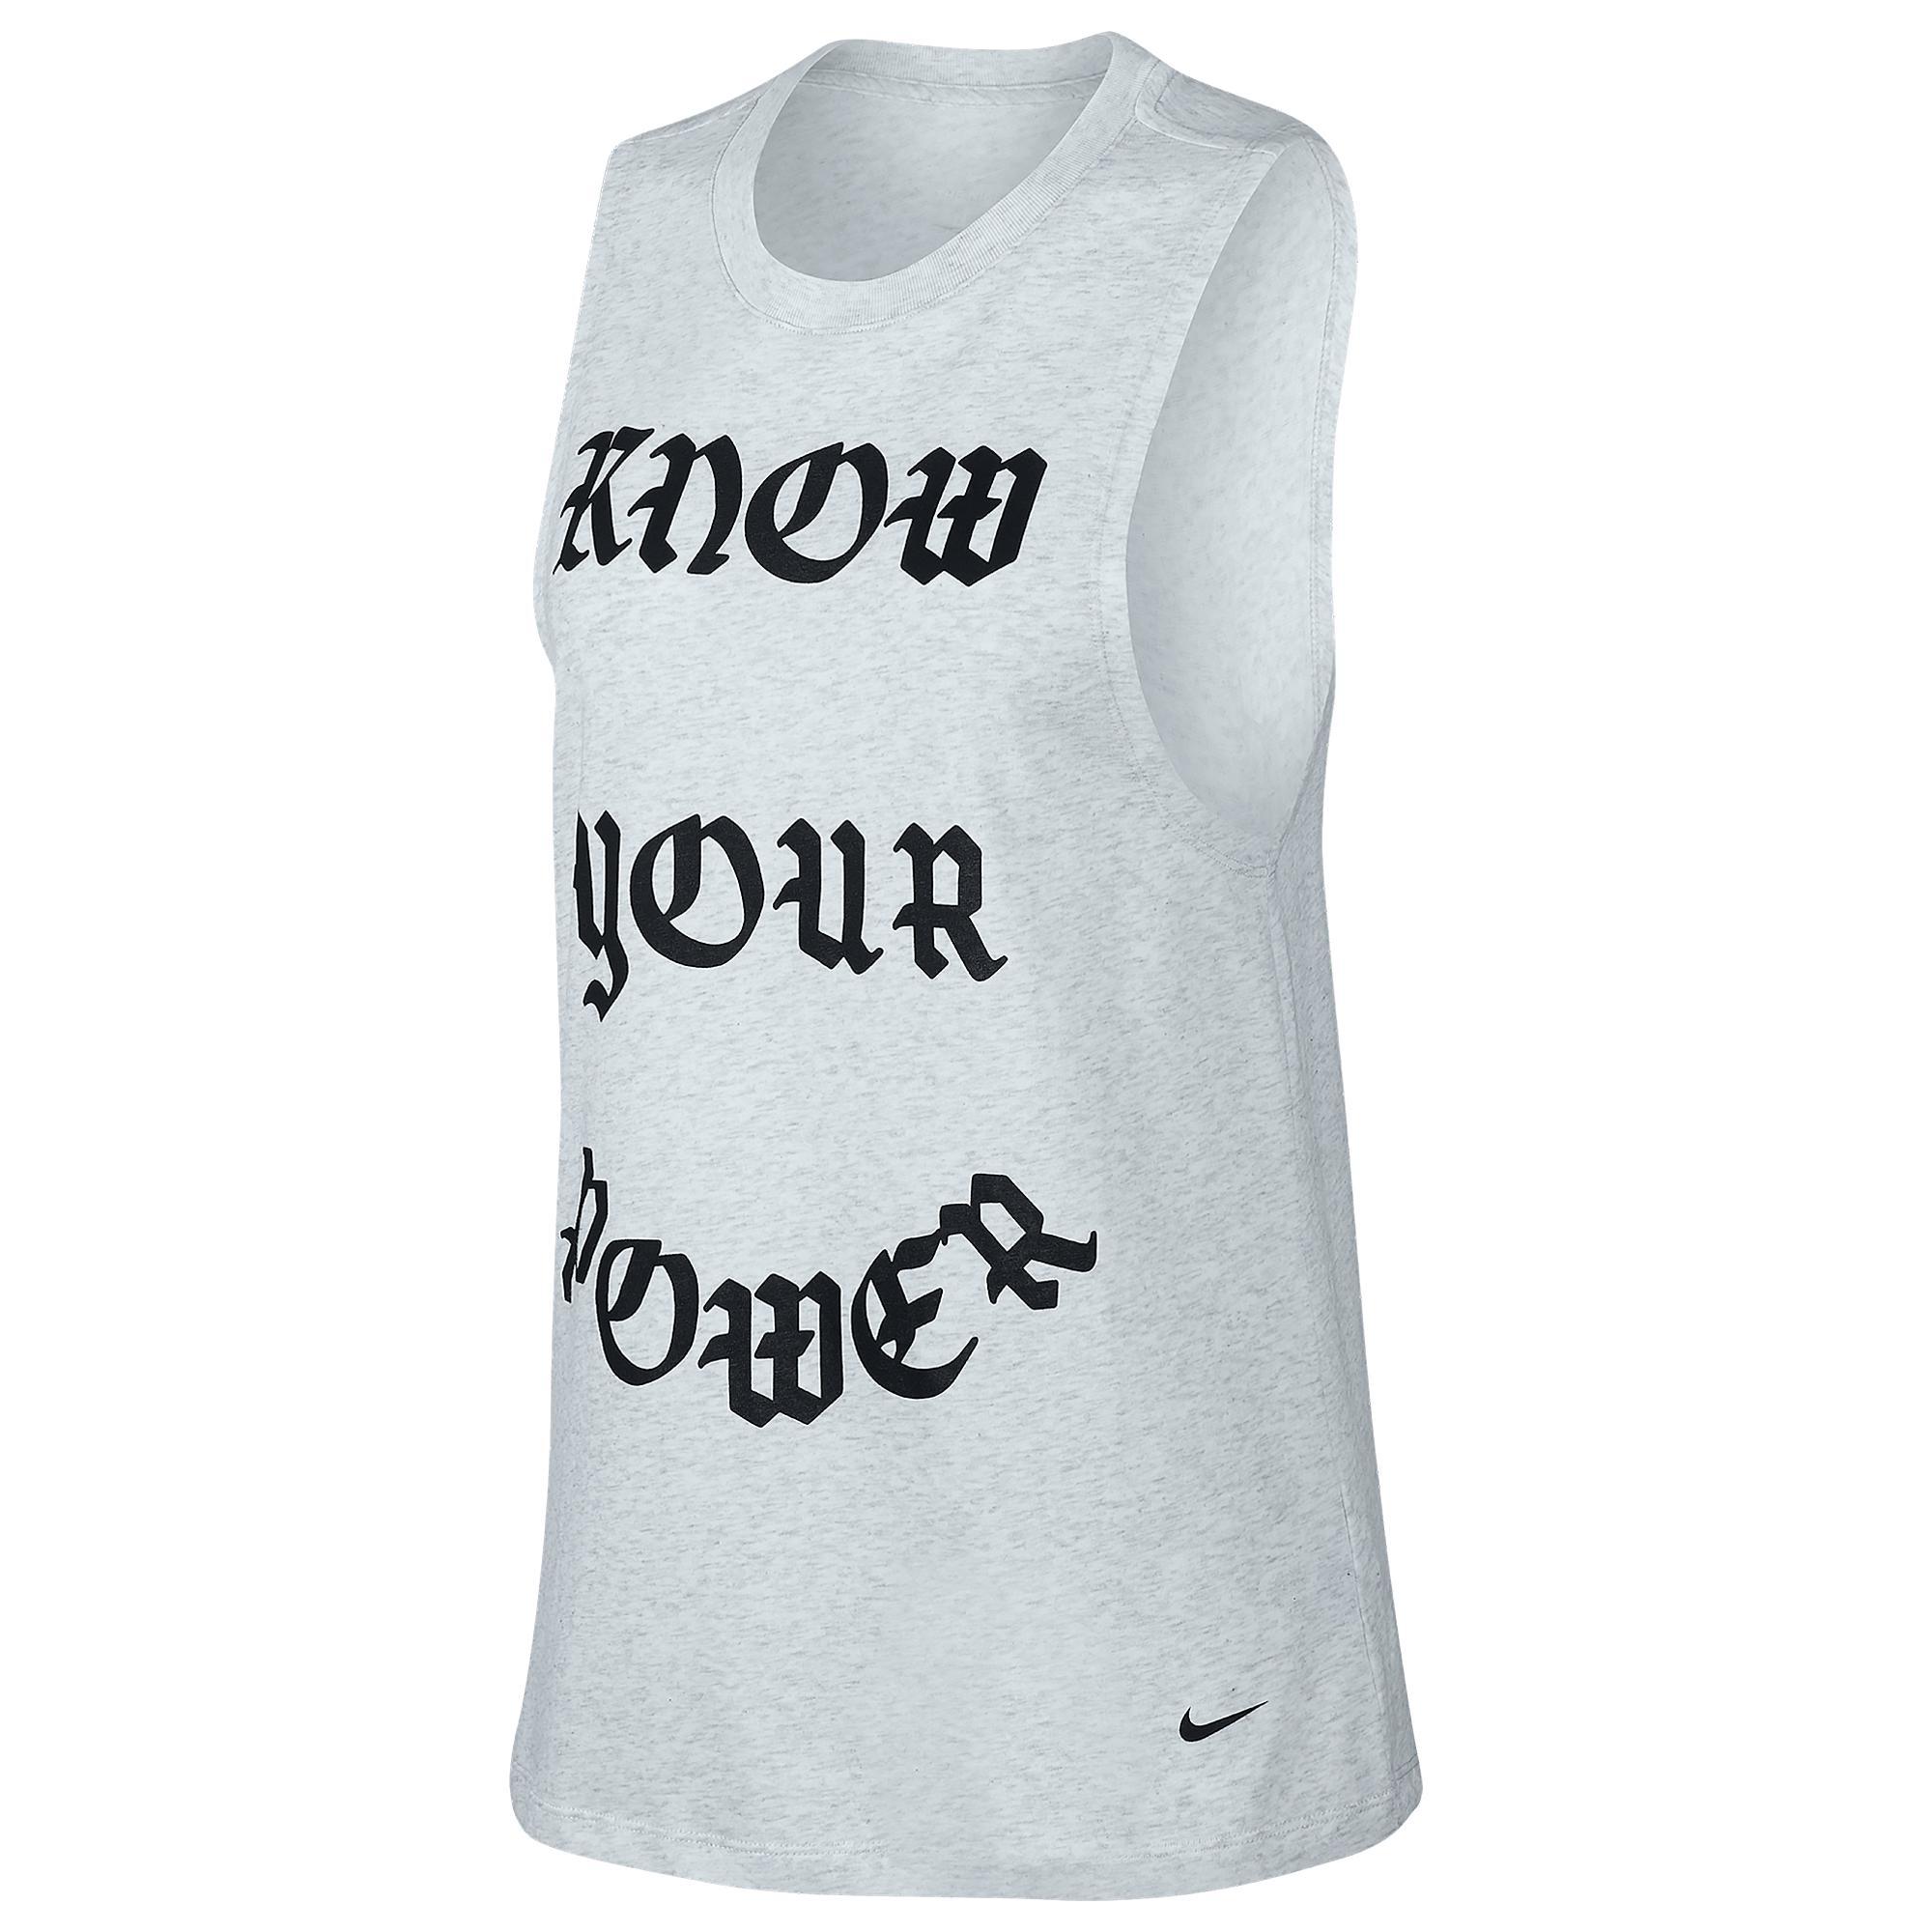 94a4888869bee Lyst - Nike Goddess Muscle Tank in Black